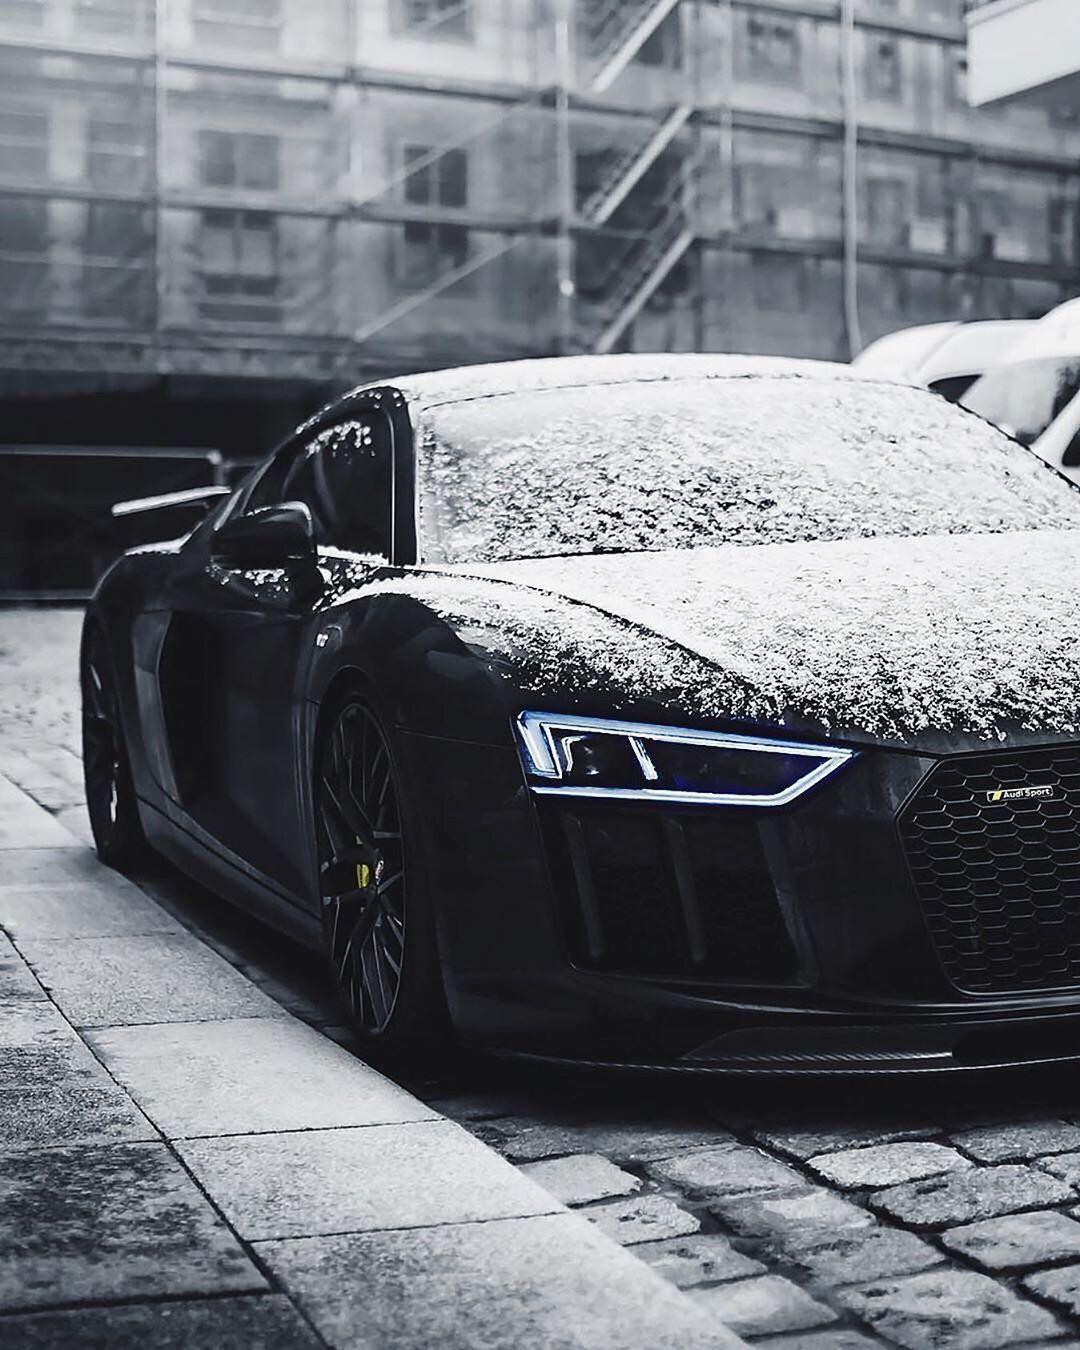 Audi Sport Car Pictures Black Audi Audi R8 Wallpaper Audi R8 V10